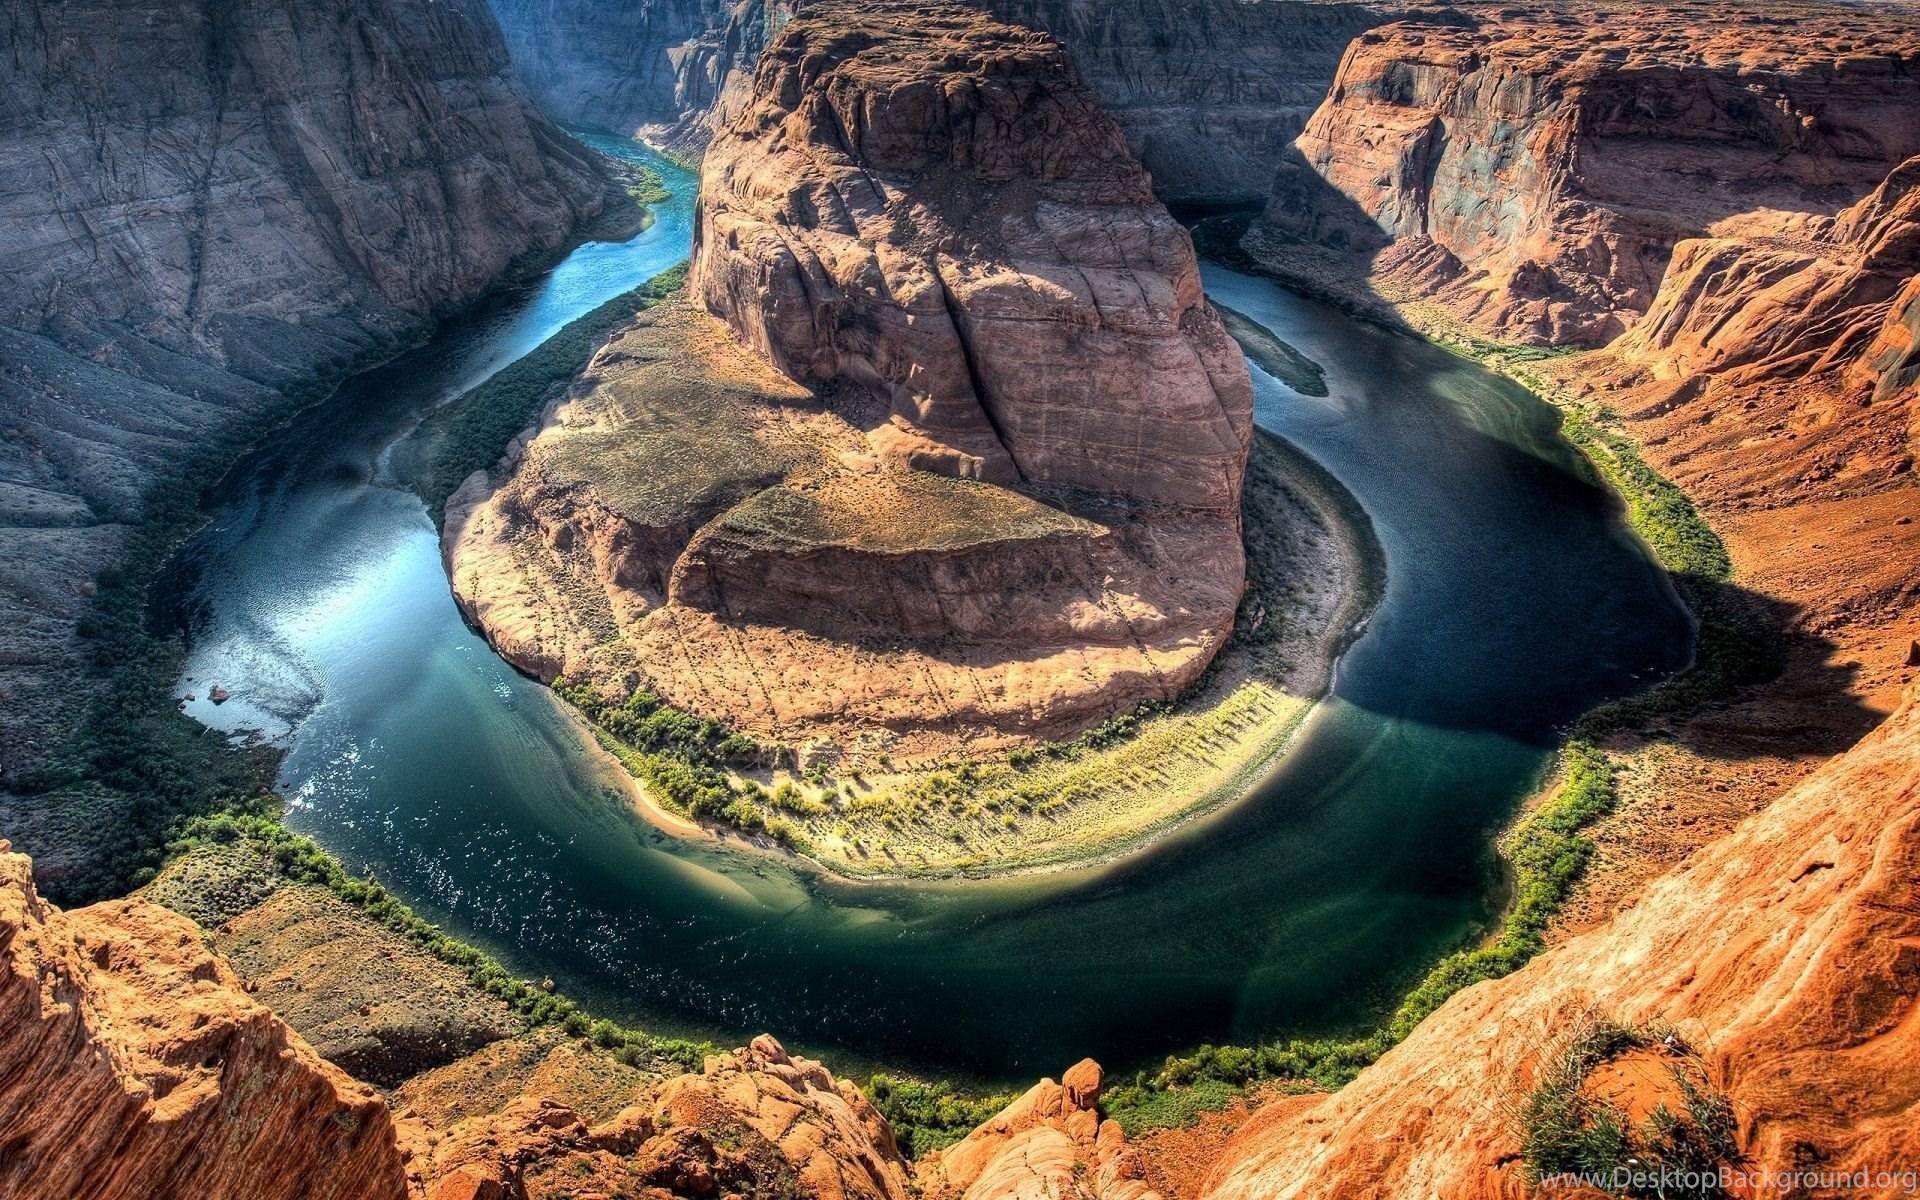 Landscape Cute Desktop Images Windows 10 Mac Wallpaper Sky